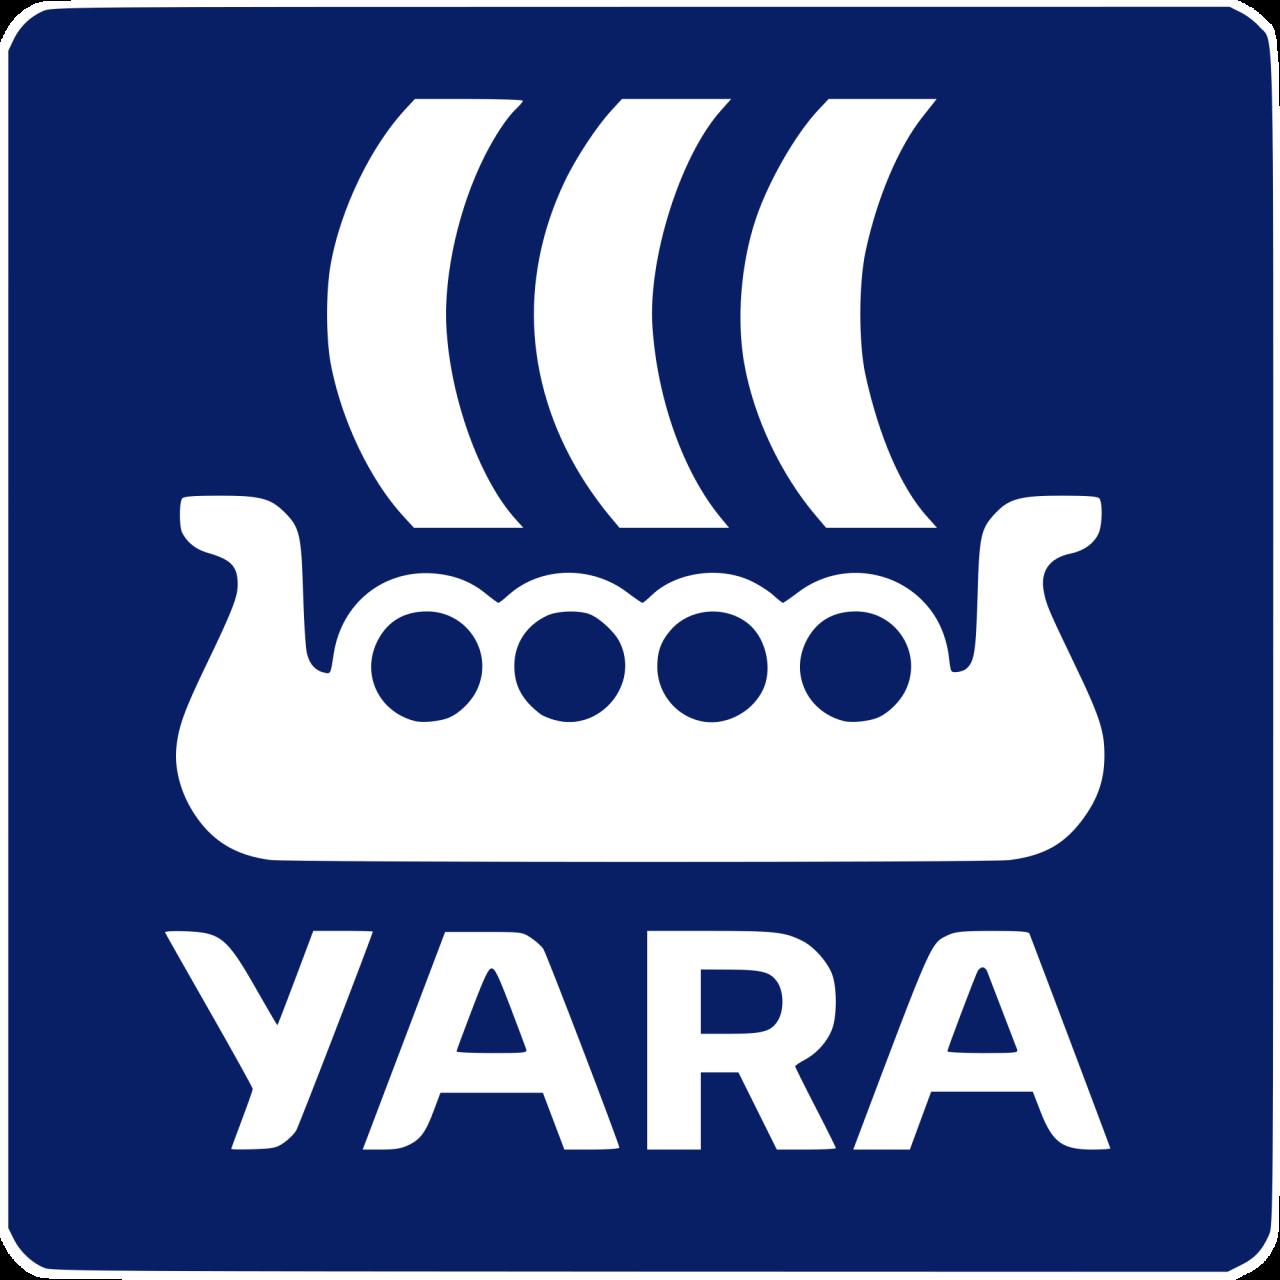 YARA ITALIA S.p.a.